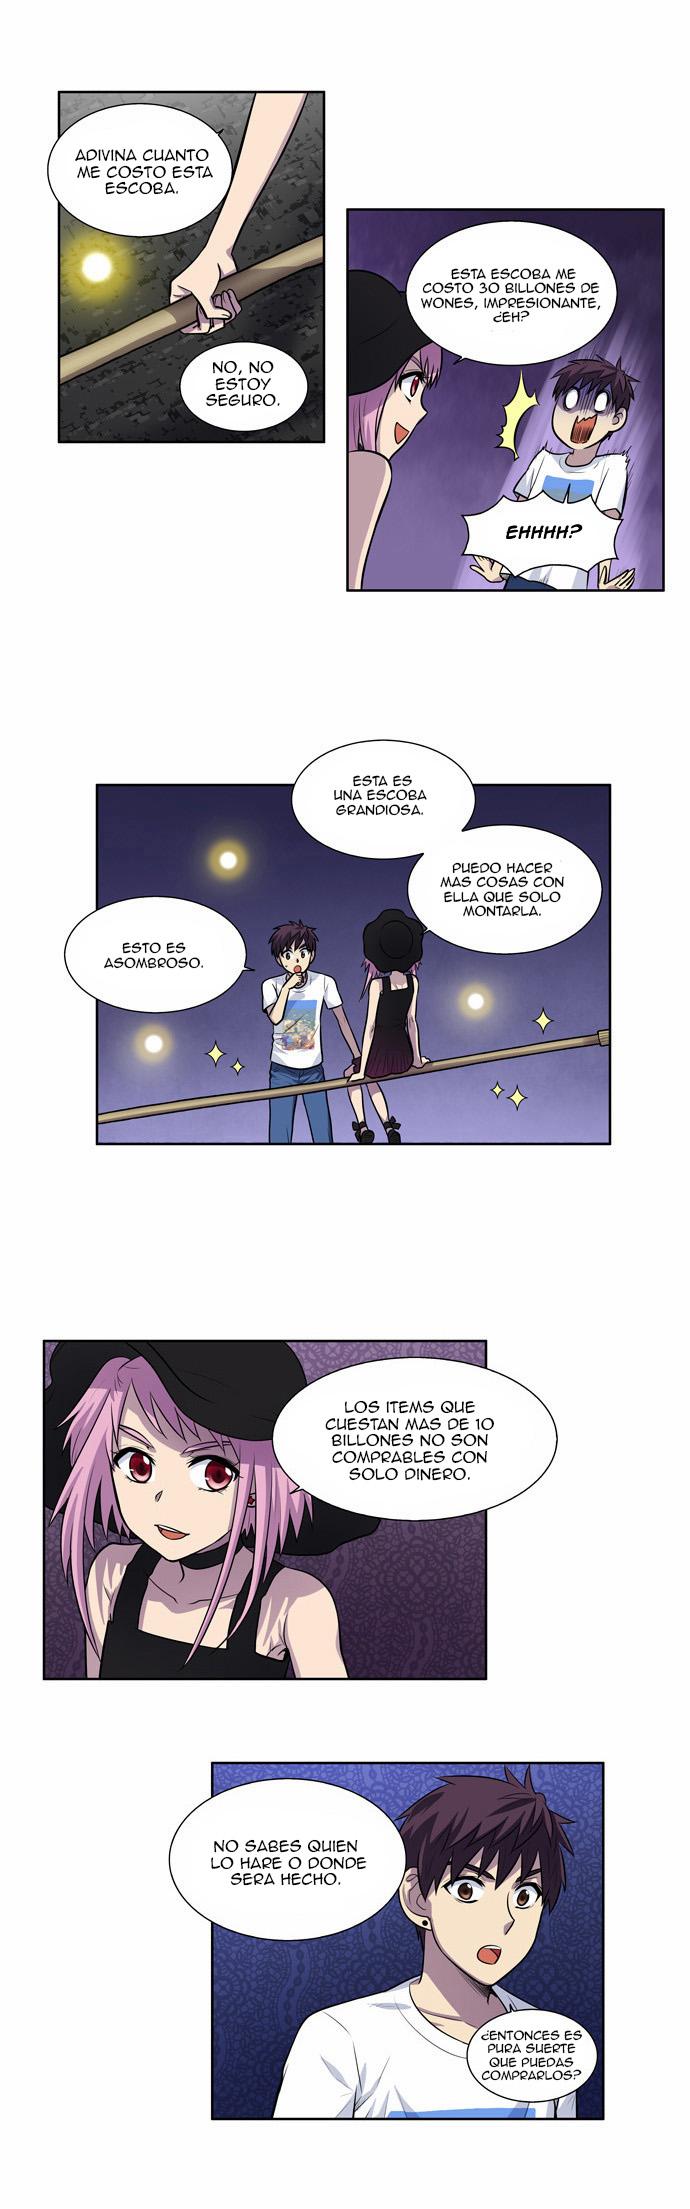 http://c5.ninemanga.com/es_manga/61/1725/416522/5091f0c8b938bc273a325d9a967b647a.jpg Page 14